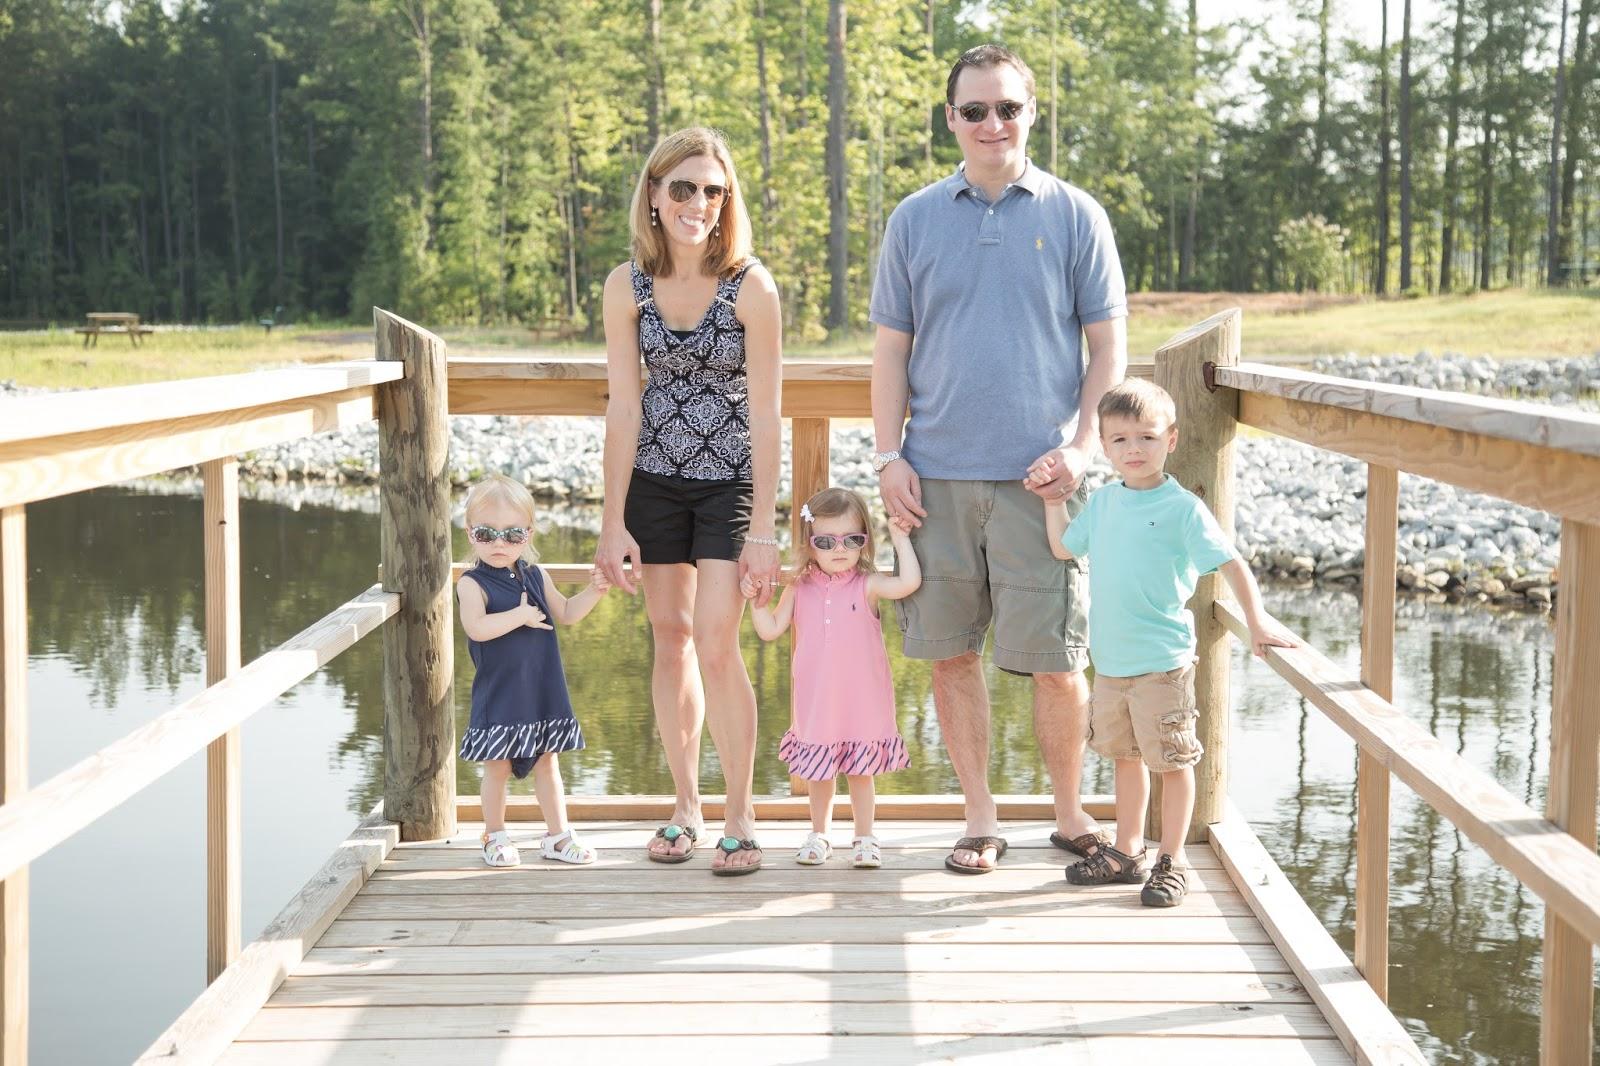 Hagge+Family+blog-13.jpg